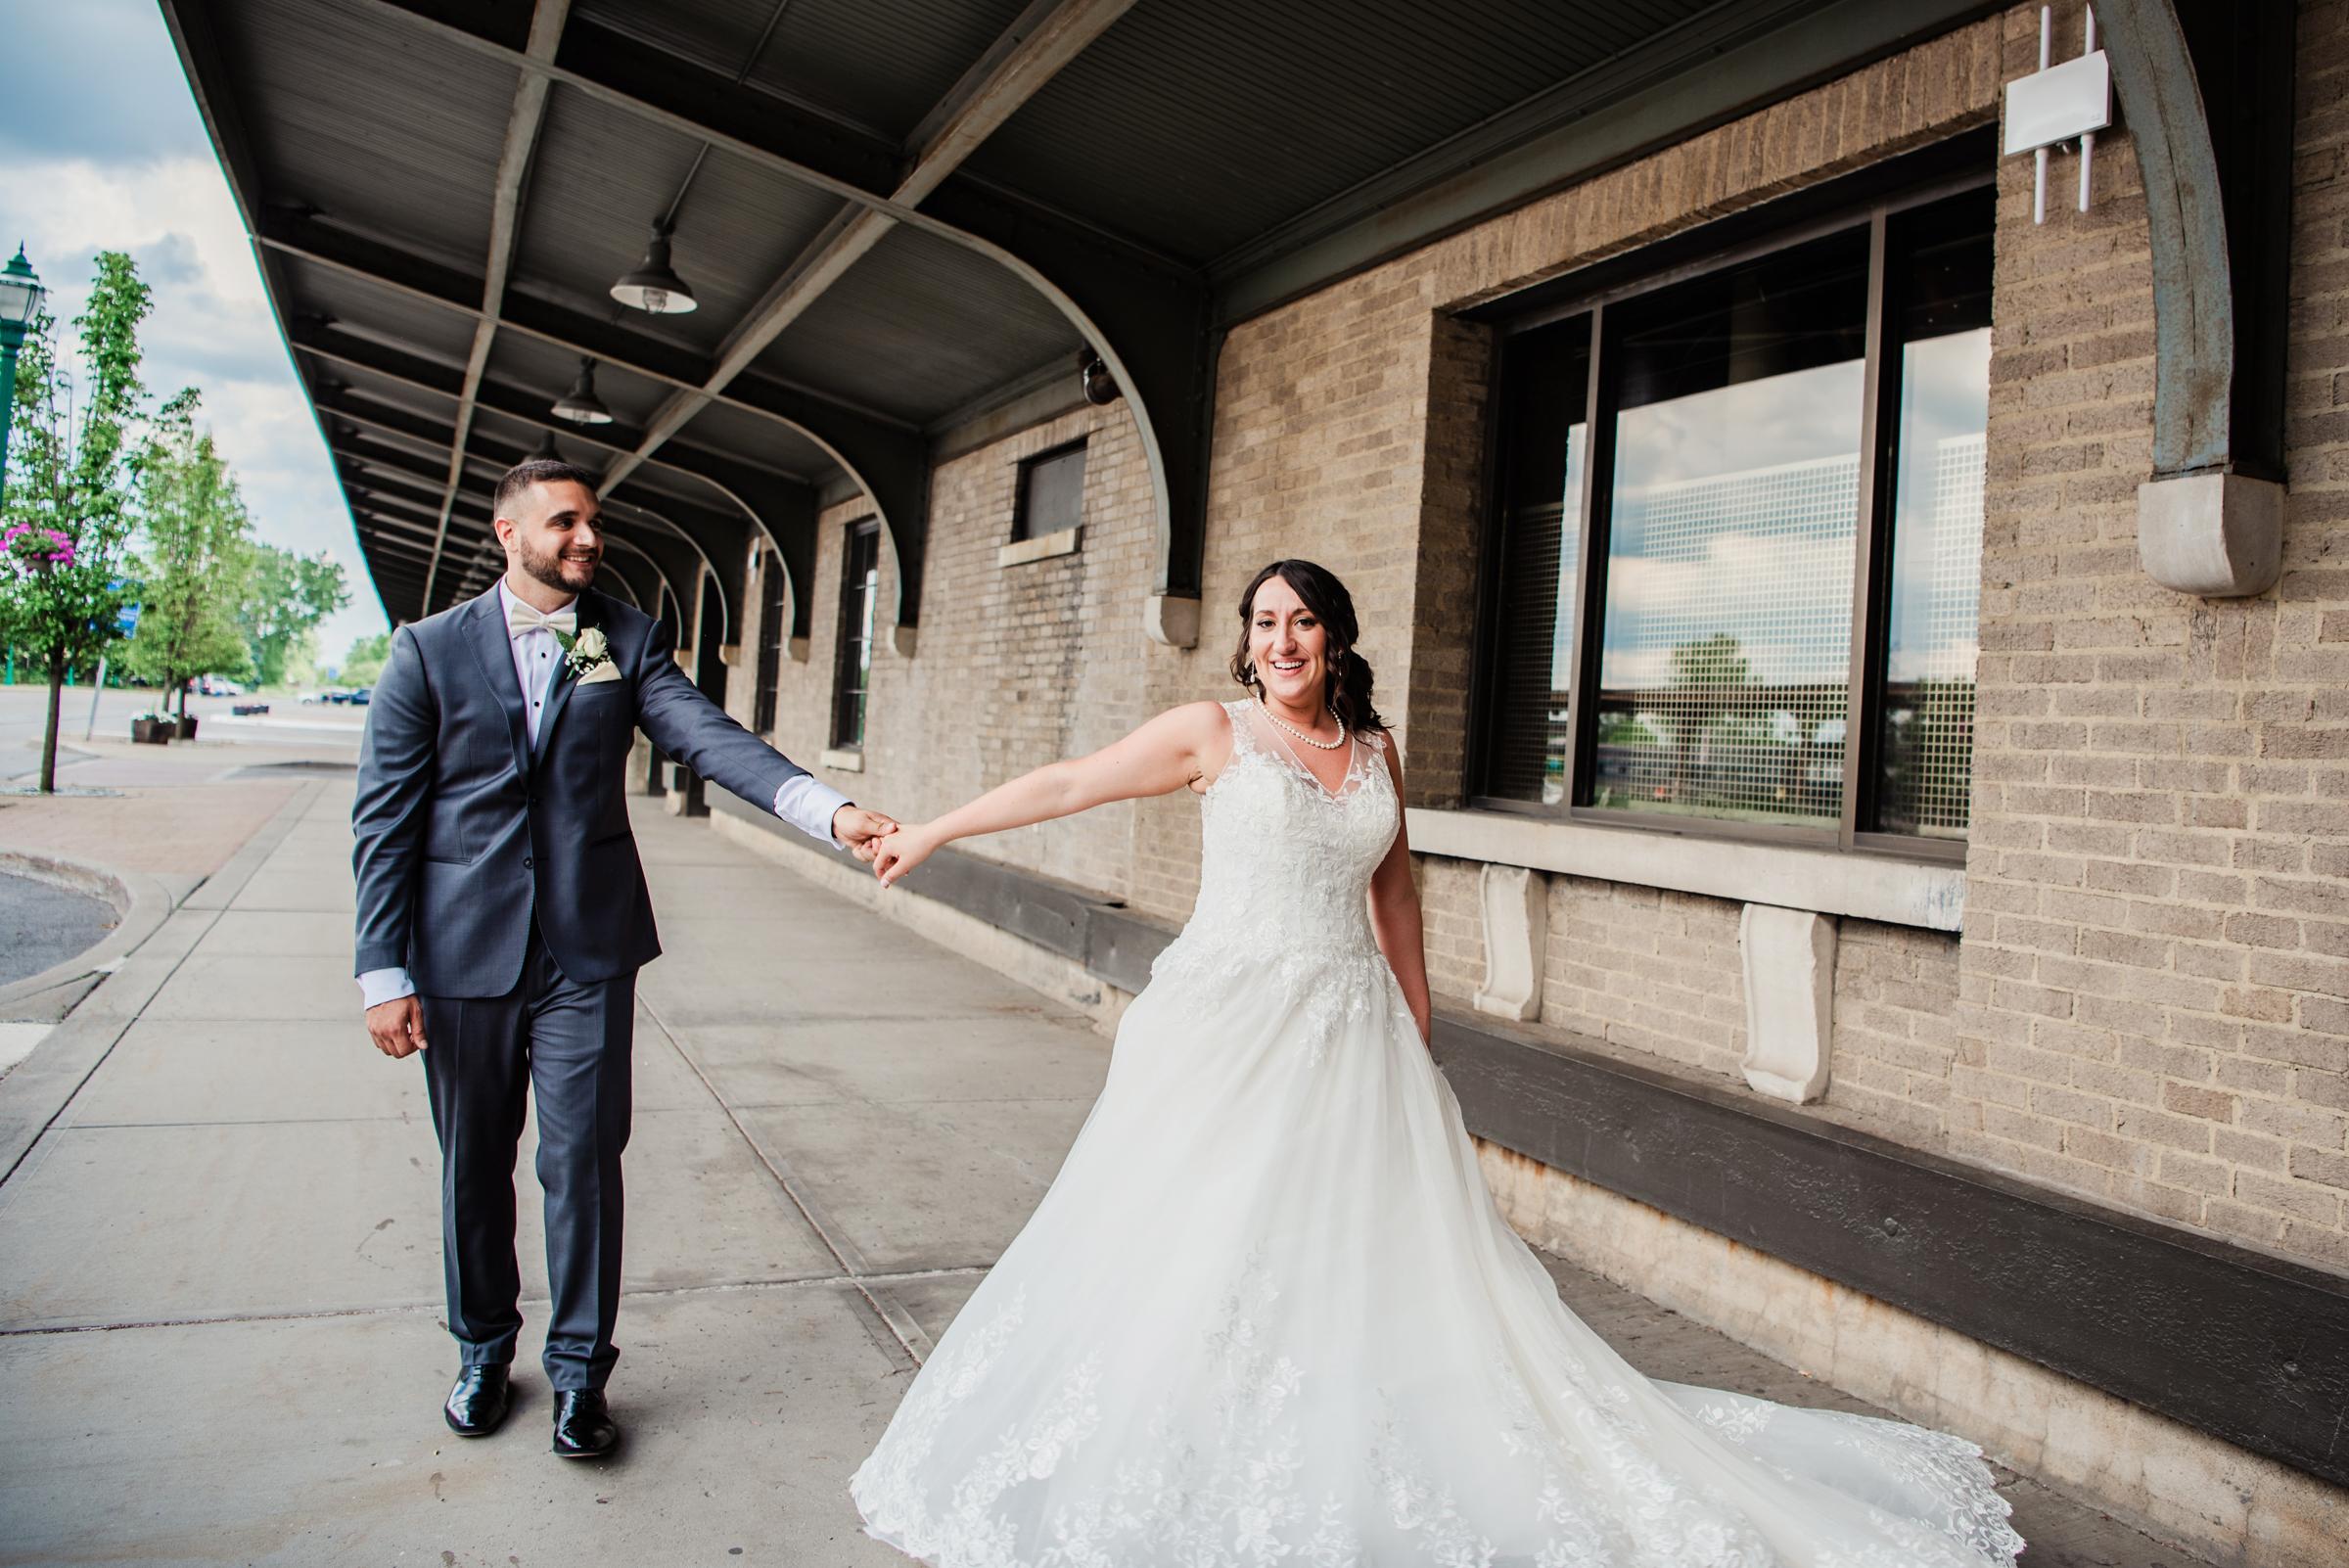 Historic_Old_St_Johns_Church_Valentinos_Banquet_Hall_Central_NY_Wedding_JILL_STUDIO_Rochester_NY_Photographer_DSC_6403.jpg